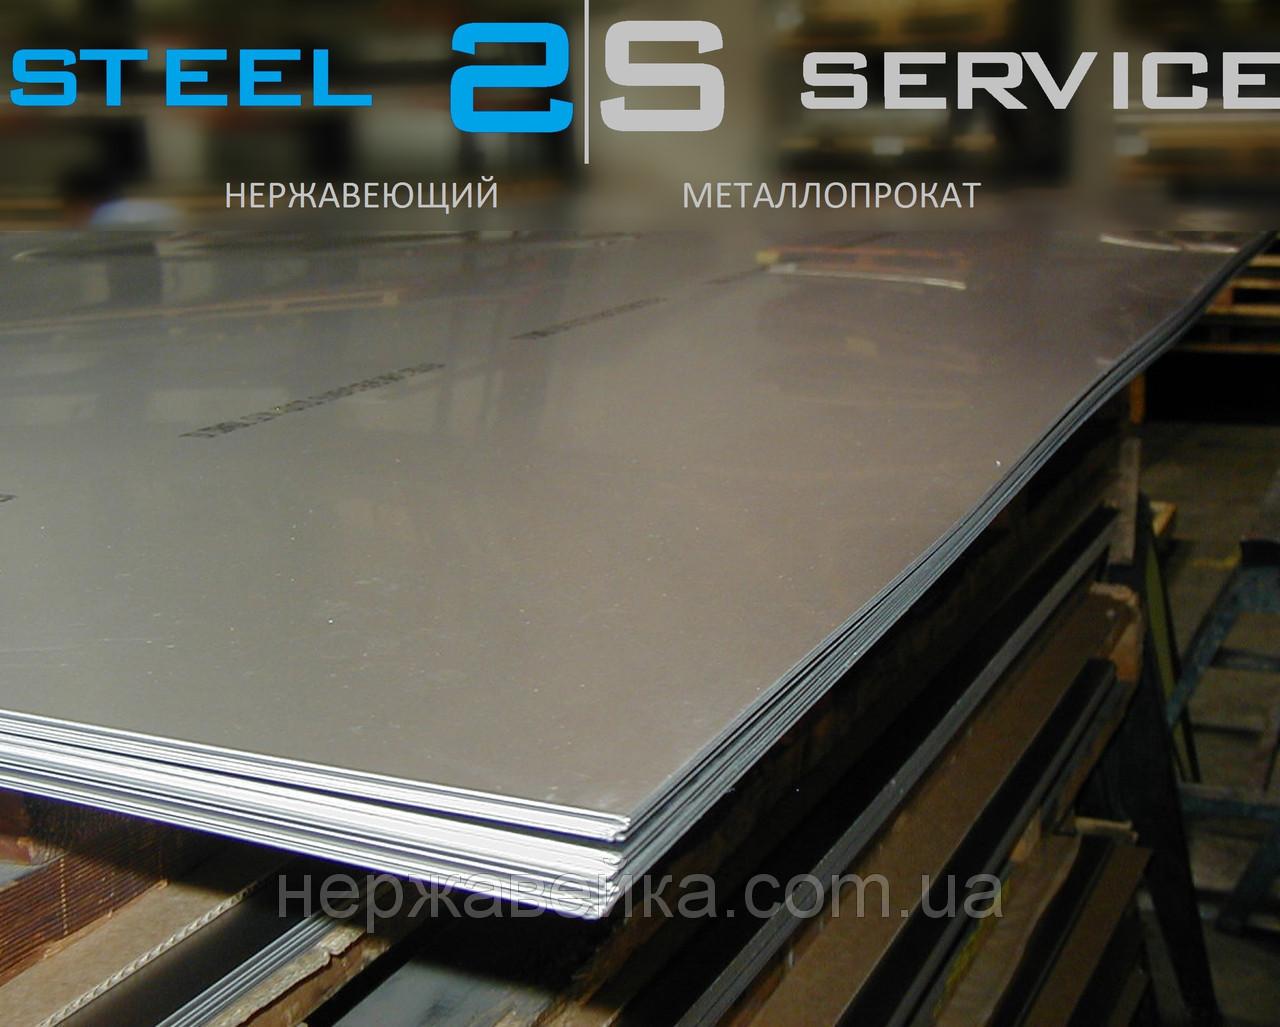 Нержавеющий лист 4х1500х6000мм  AISI 316Ti(10Х17Н13М2Т) 2B - матовый,  кислотостойкий